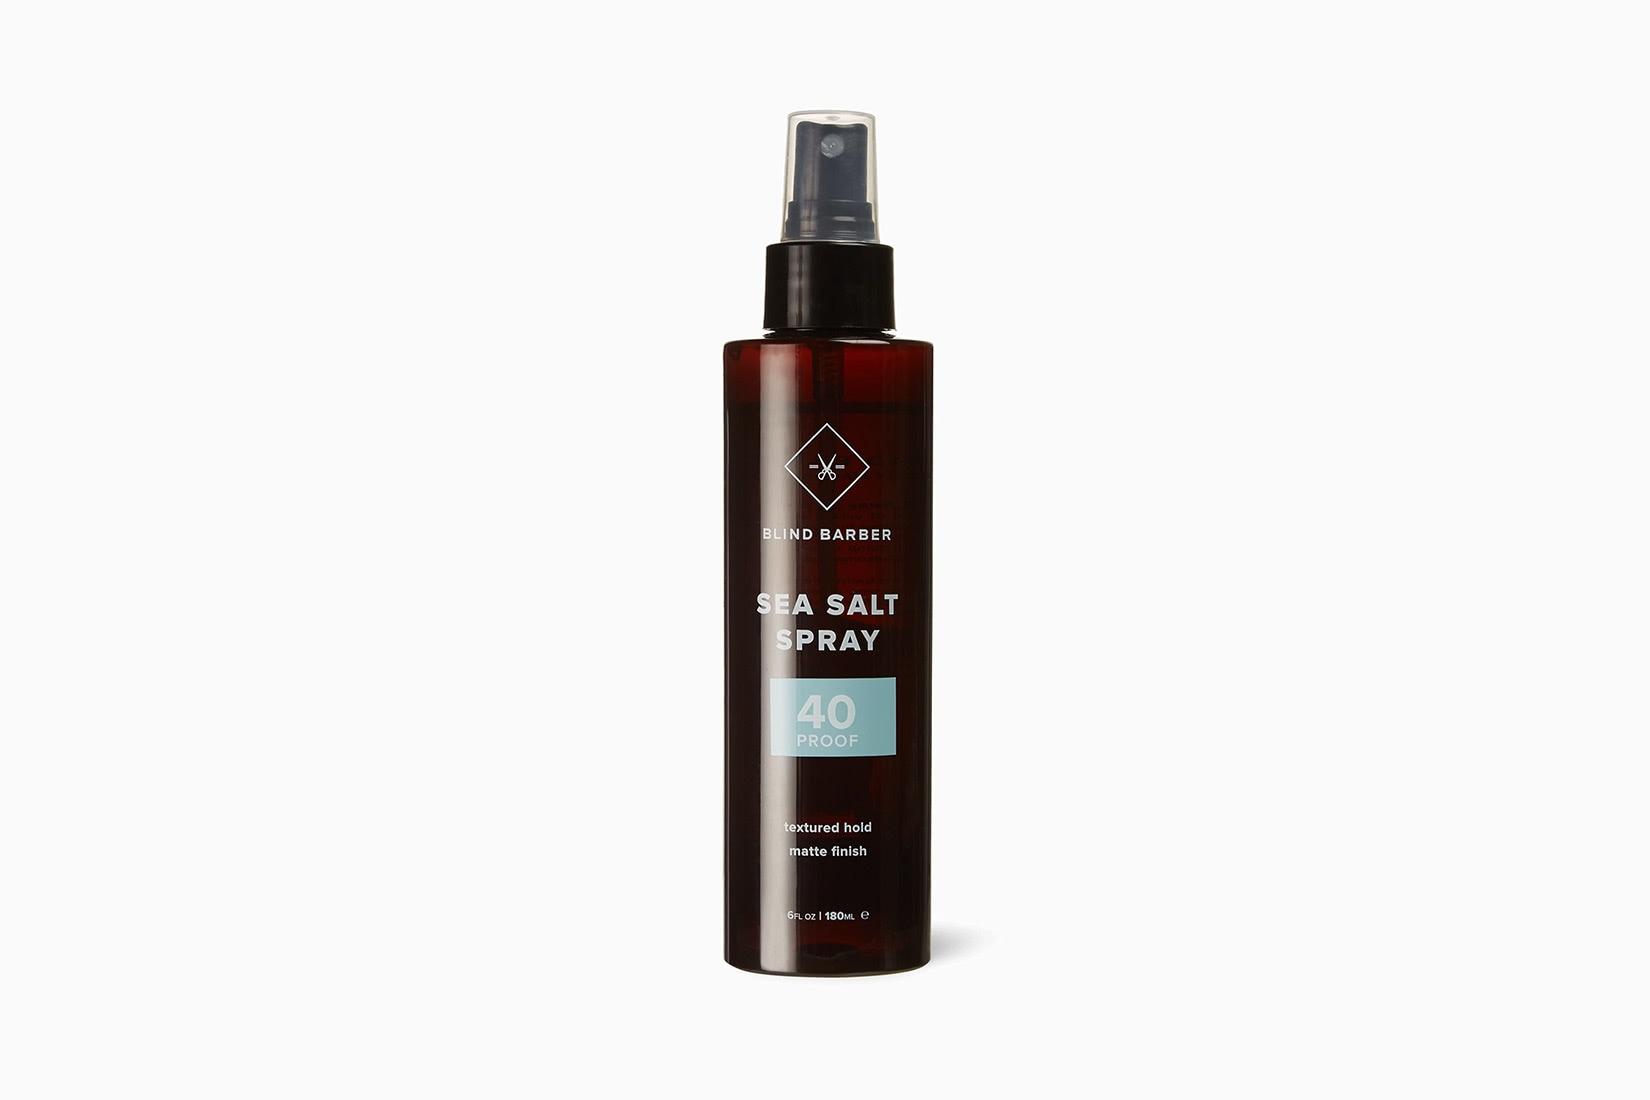 best hair styling products men blind barber salt spray luxe digital